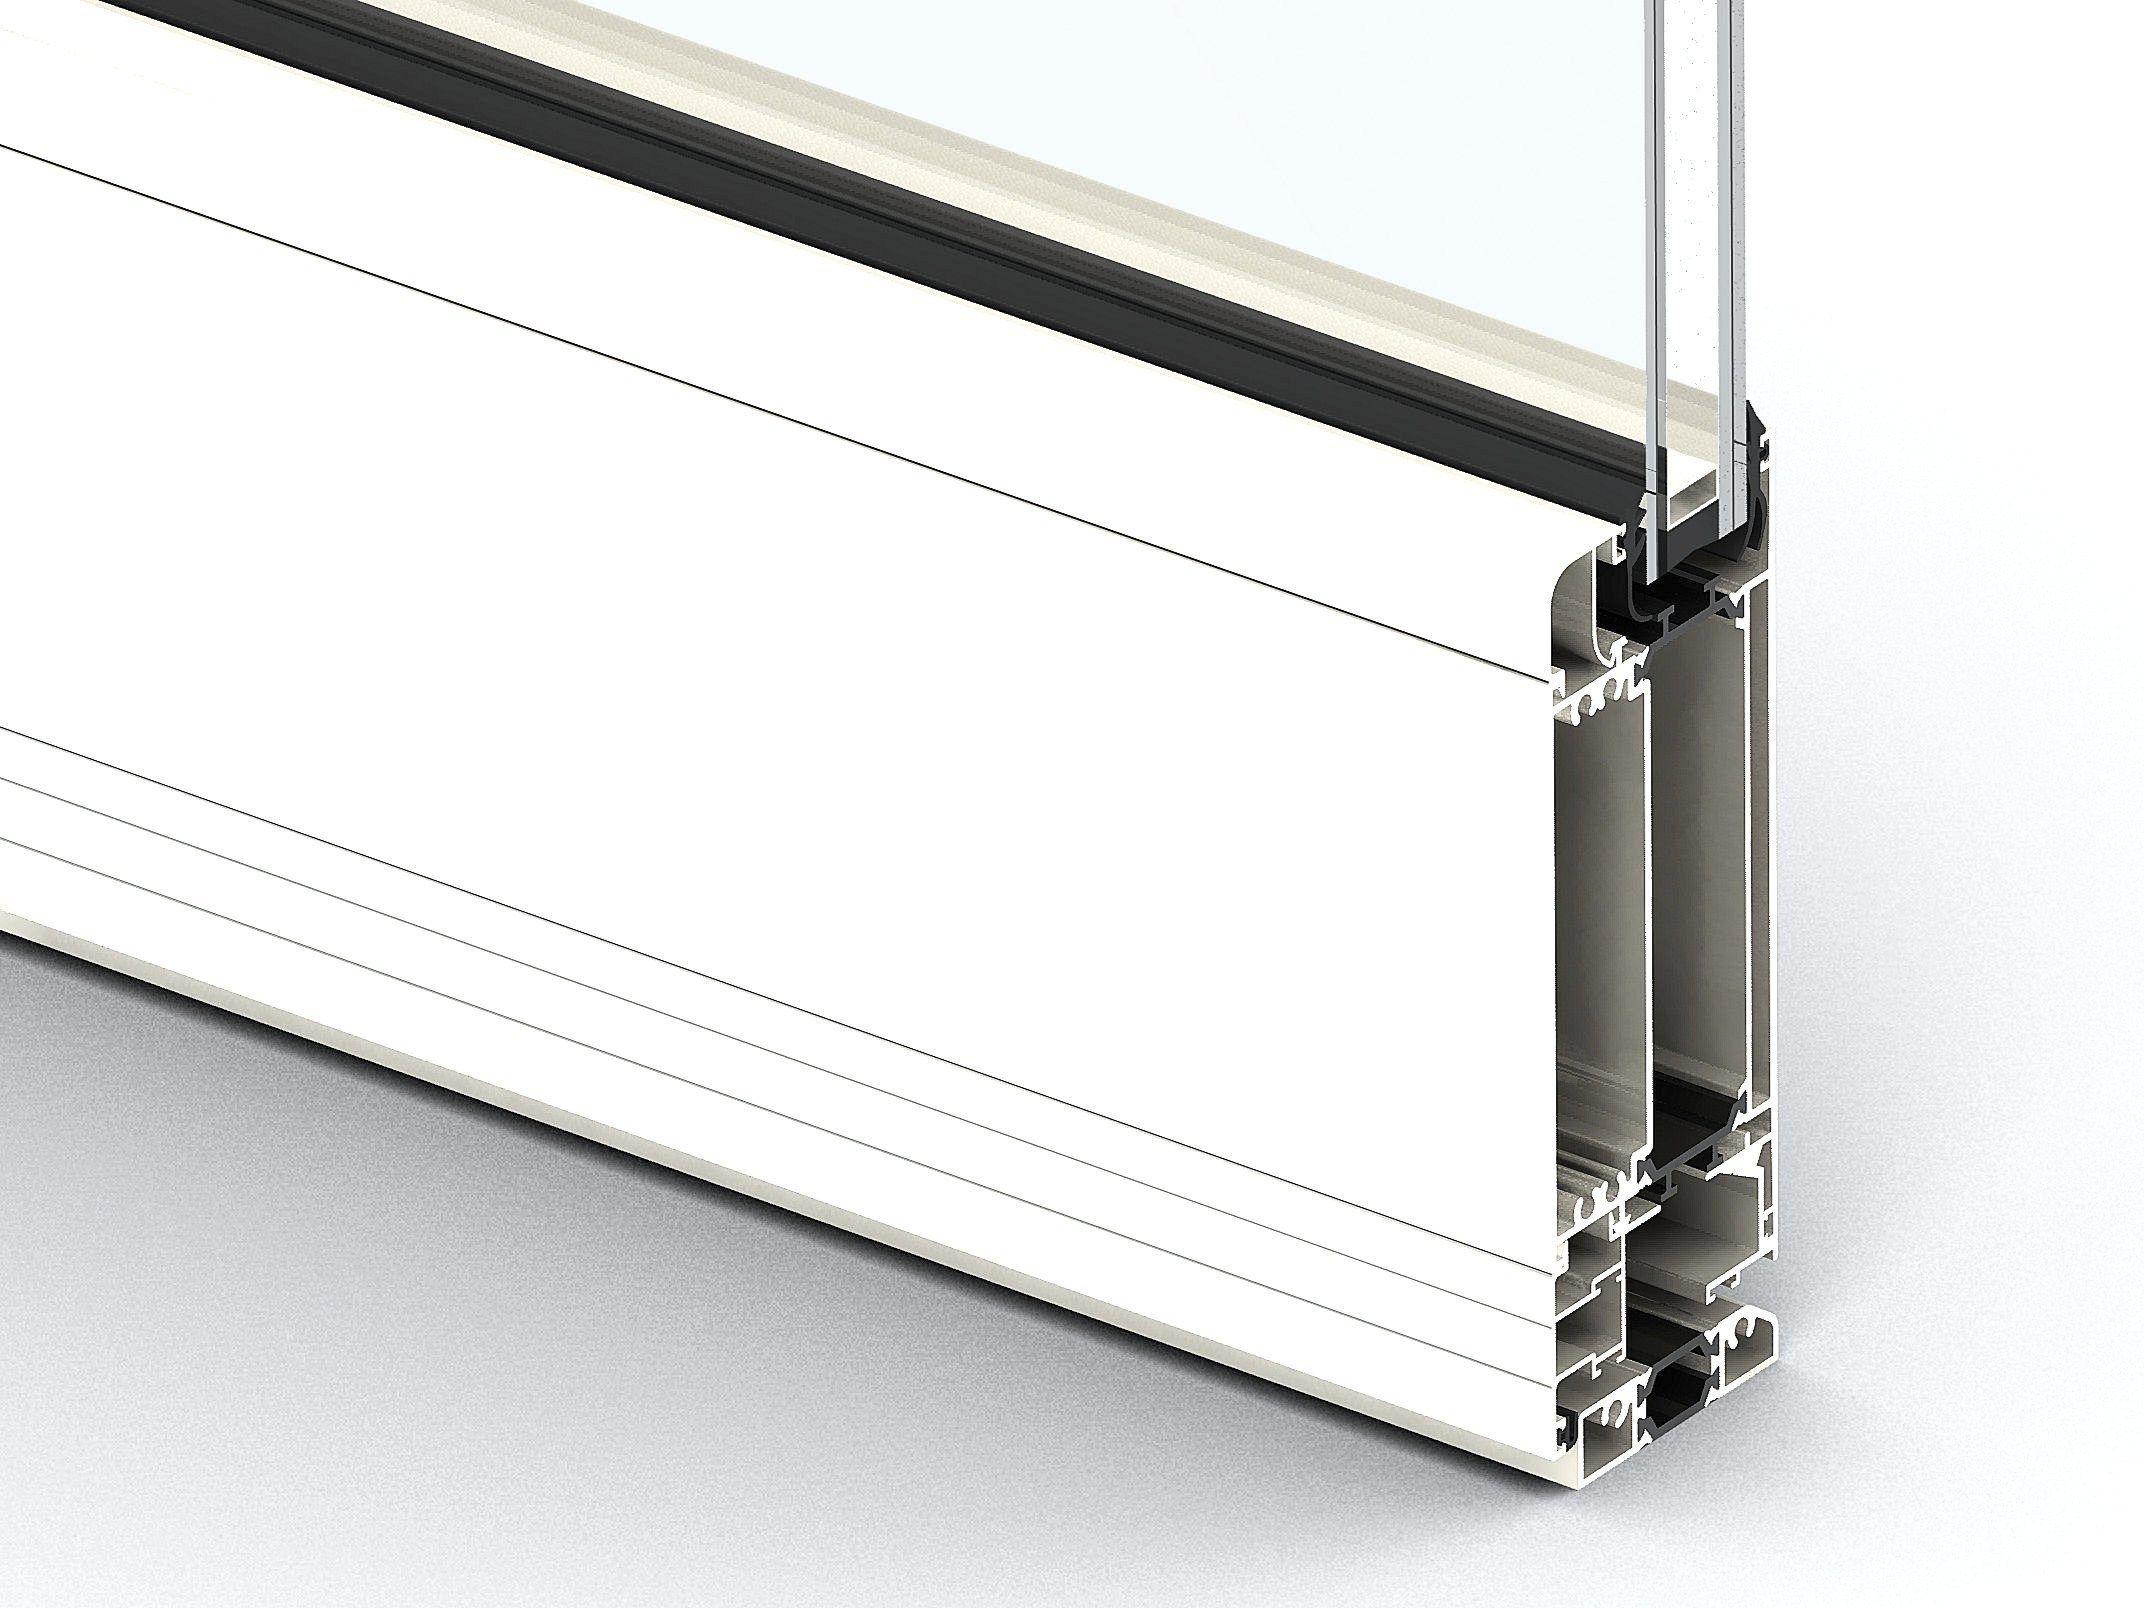 fenster aus aluminium eku 66 tt by profilati. Black Bedroom Furniture Sets. Home Design Ideas